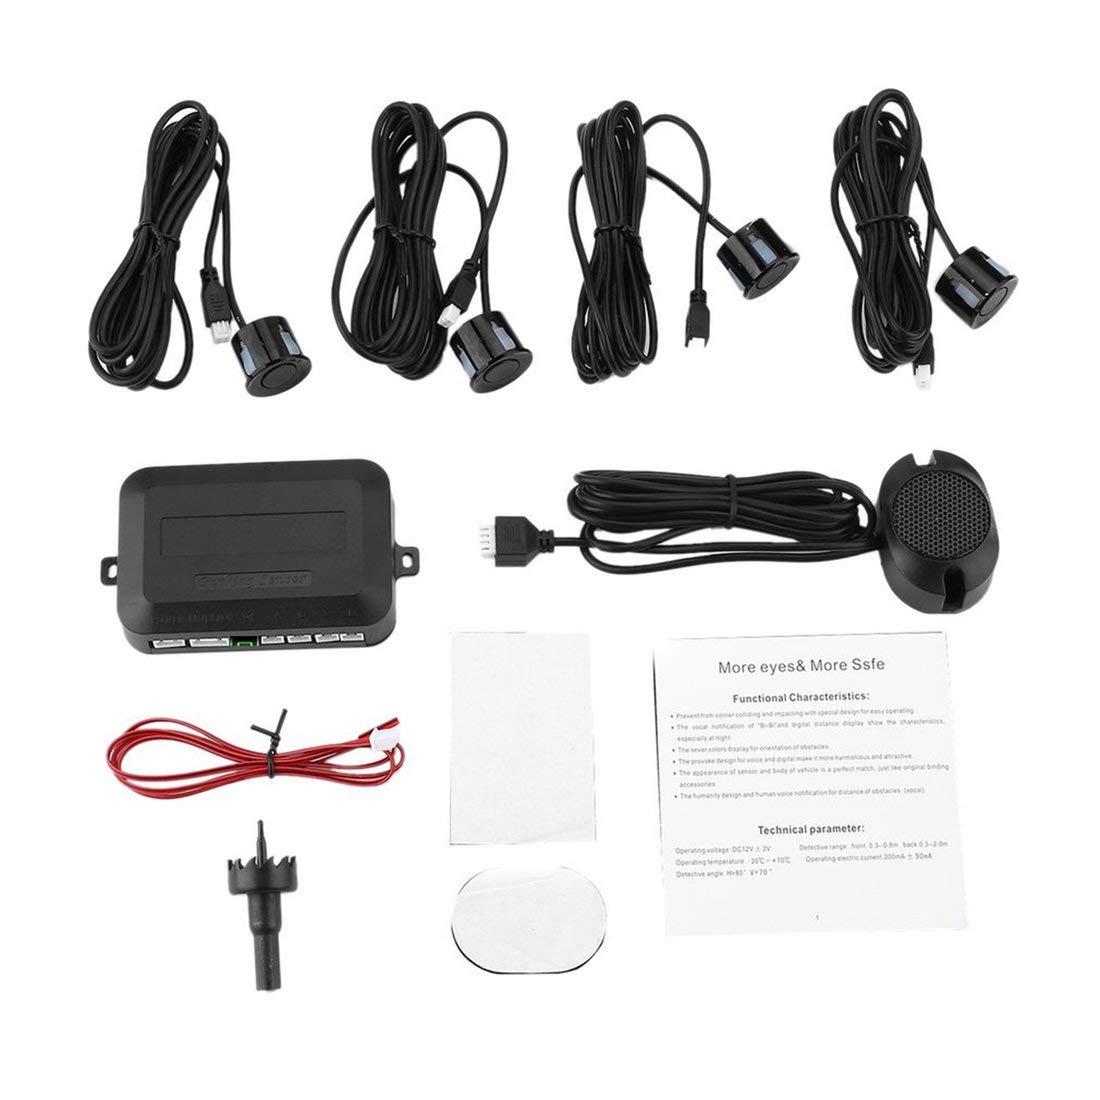 4 Car Parking Sensors Parking Auto Backup Reverse Rear Assistance Radar Rearview Buzzer Sound Alarm Monitor System Parktronic Formulaone